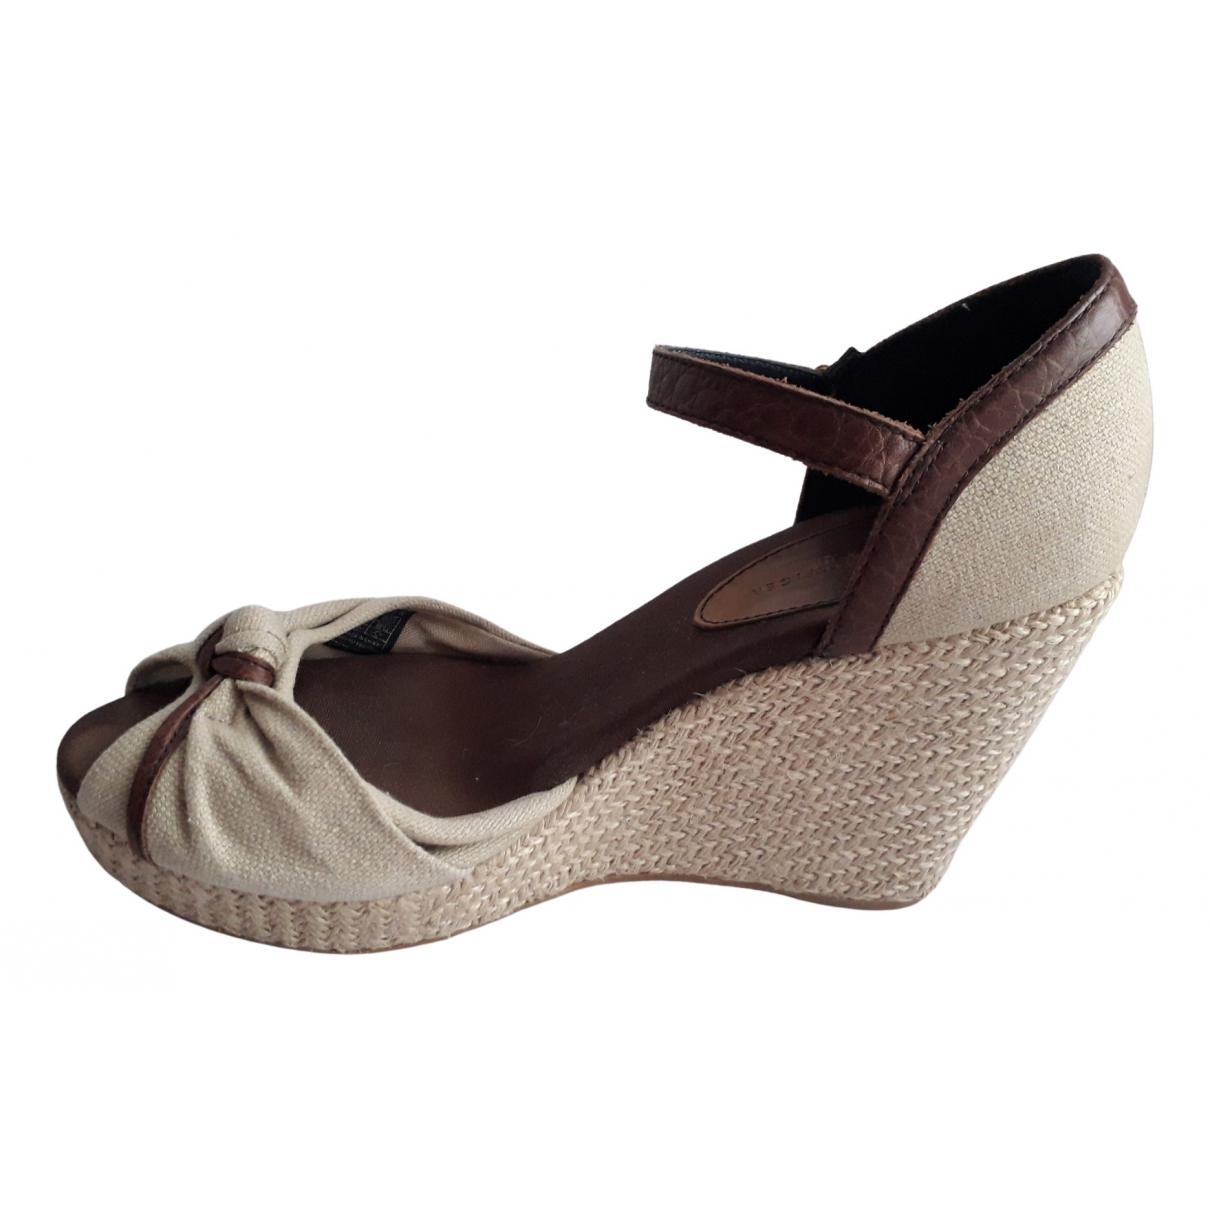 Sandalias de Lona Tommy Hilfiger